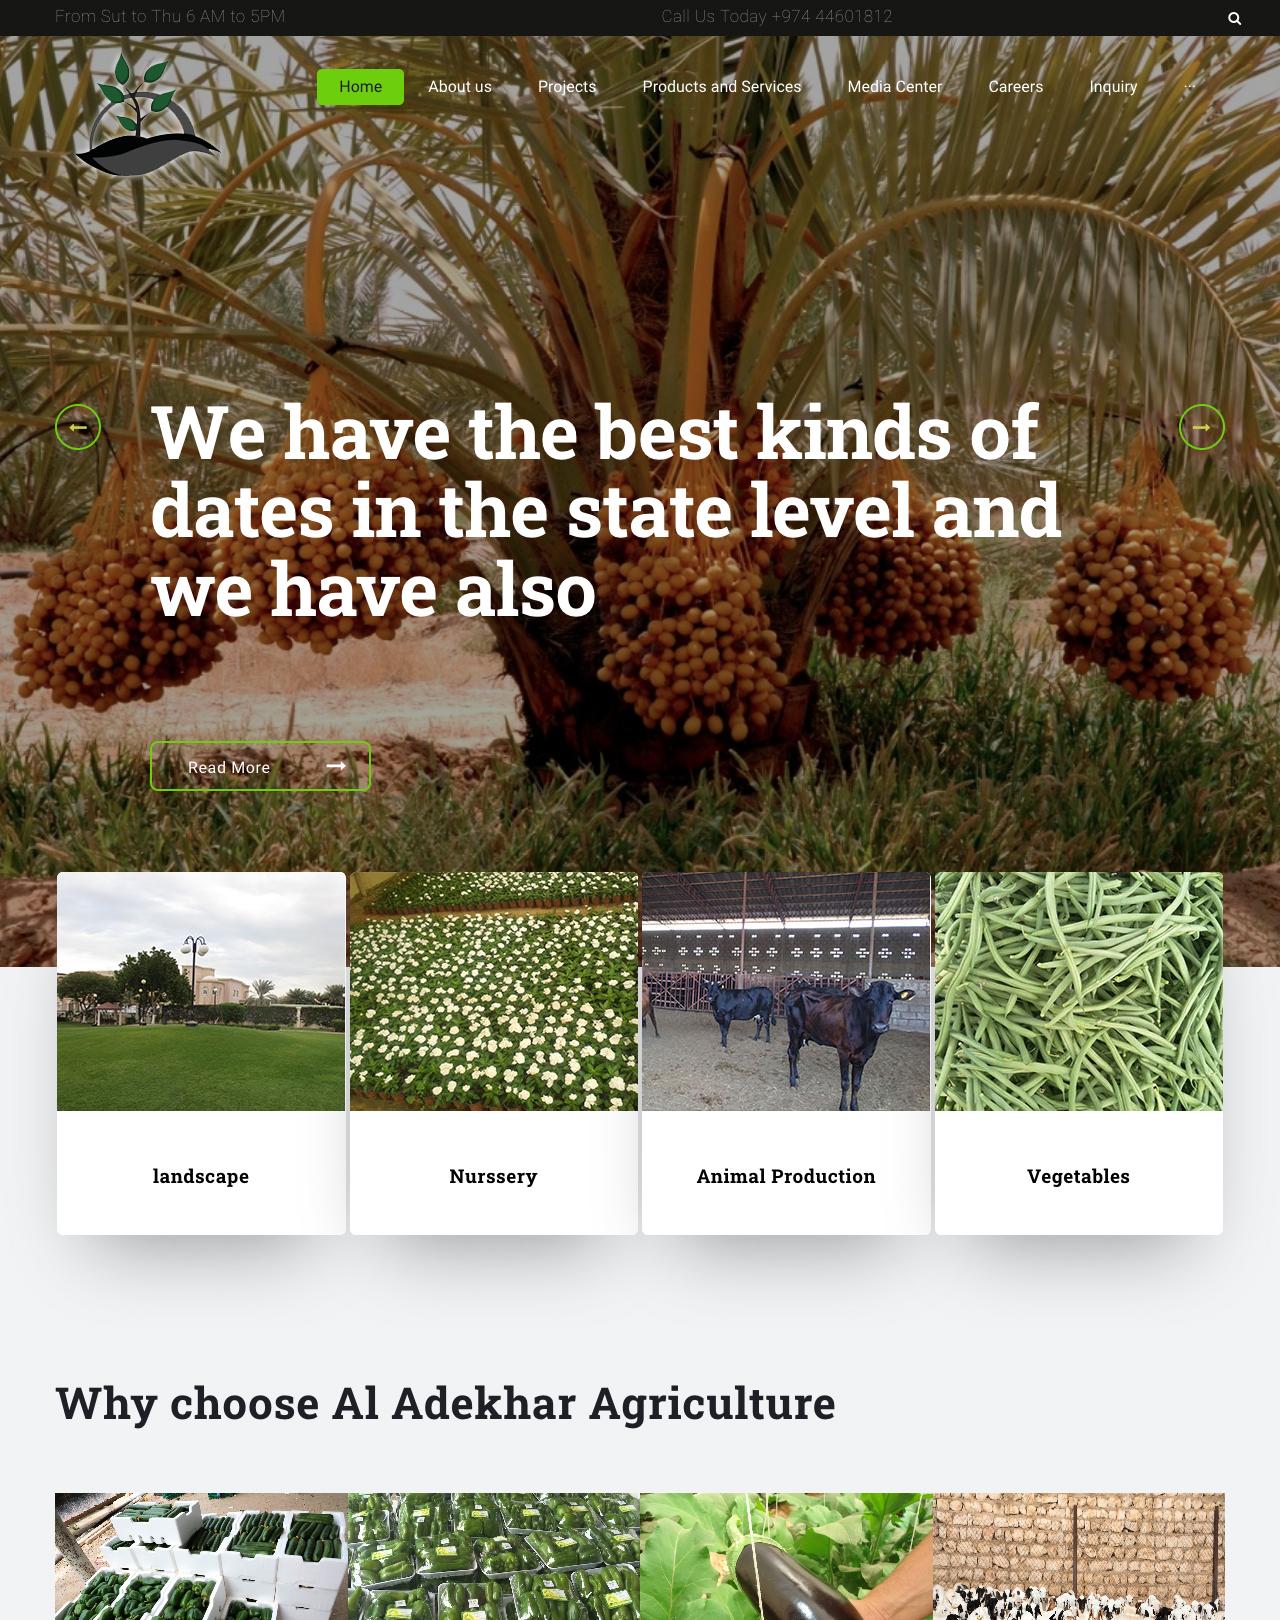 Qatar Agriculture